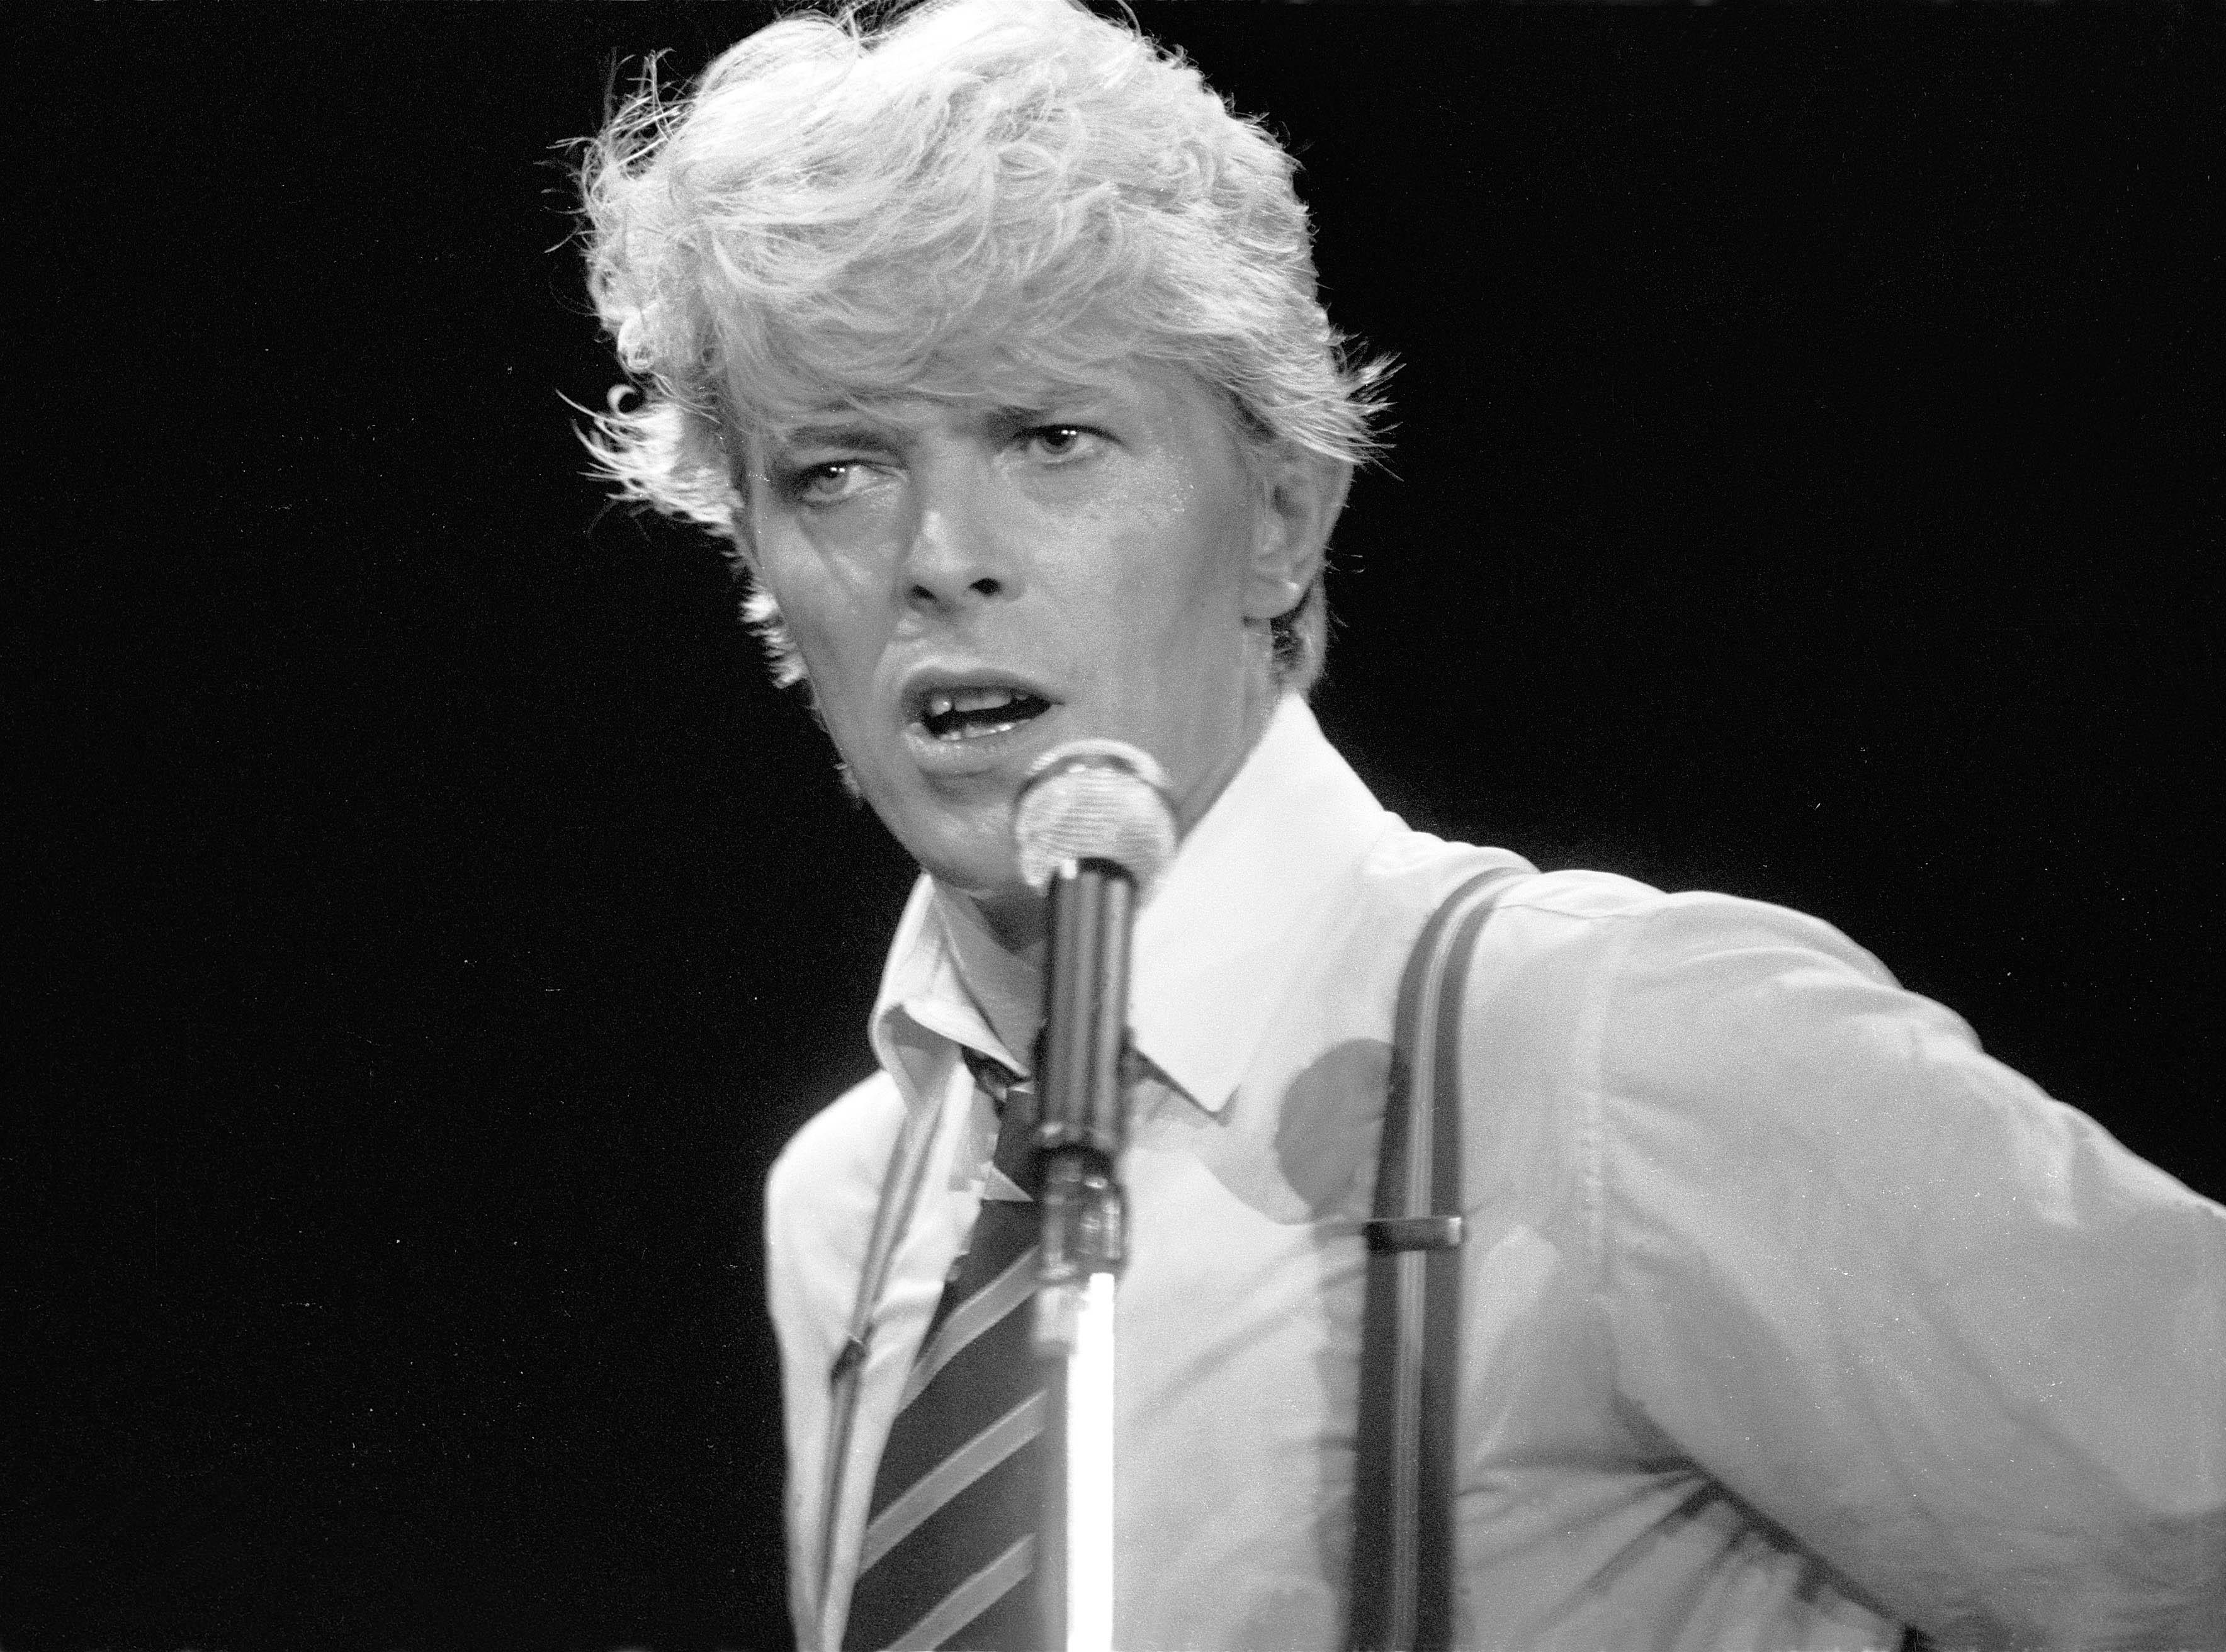 rock icon david bowie dies at 69 kut